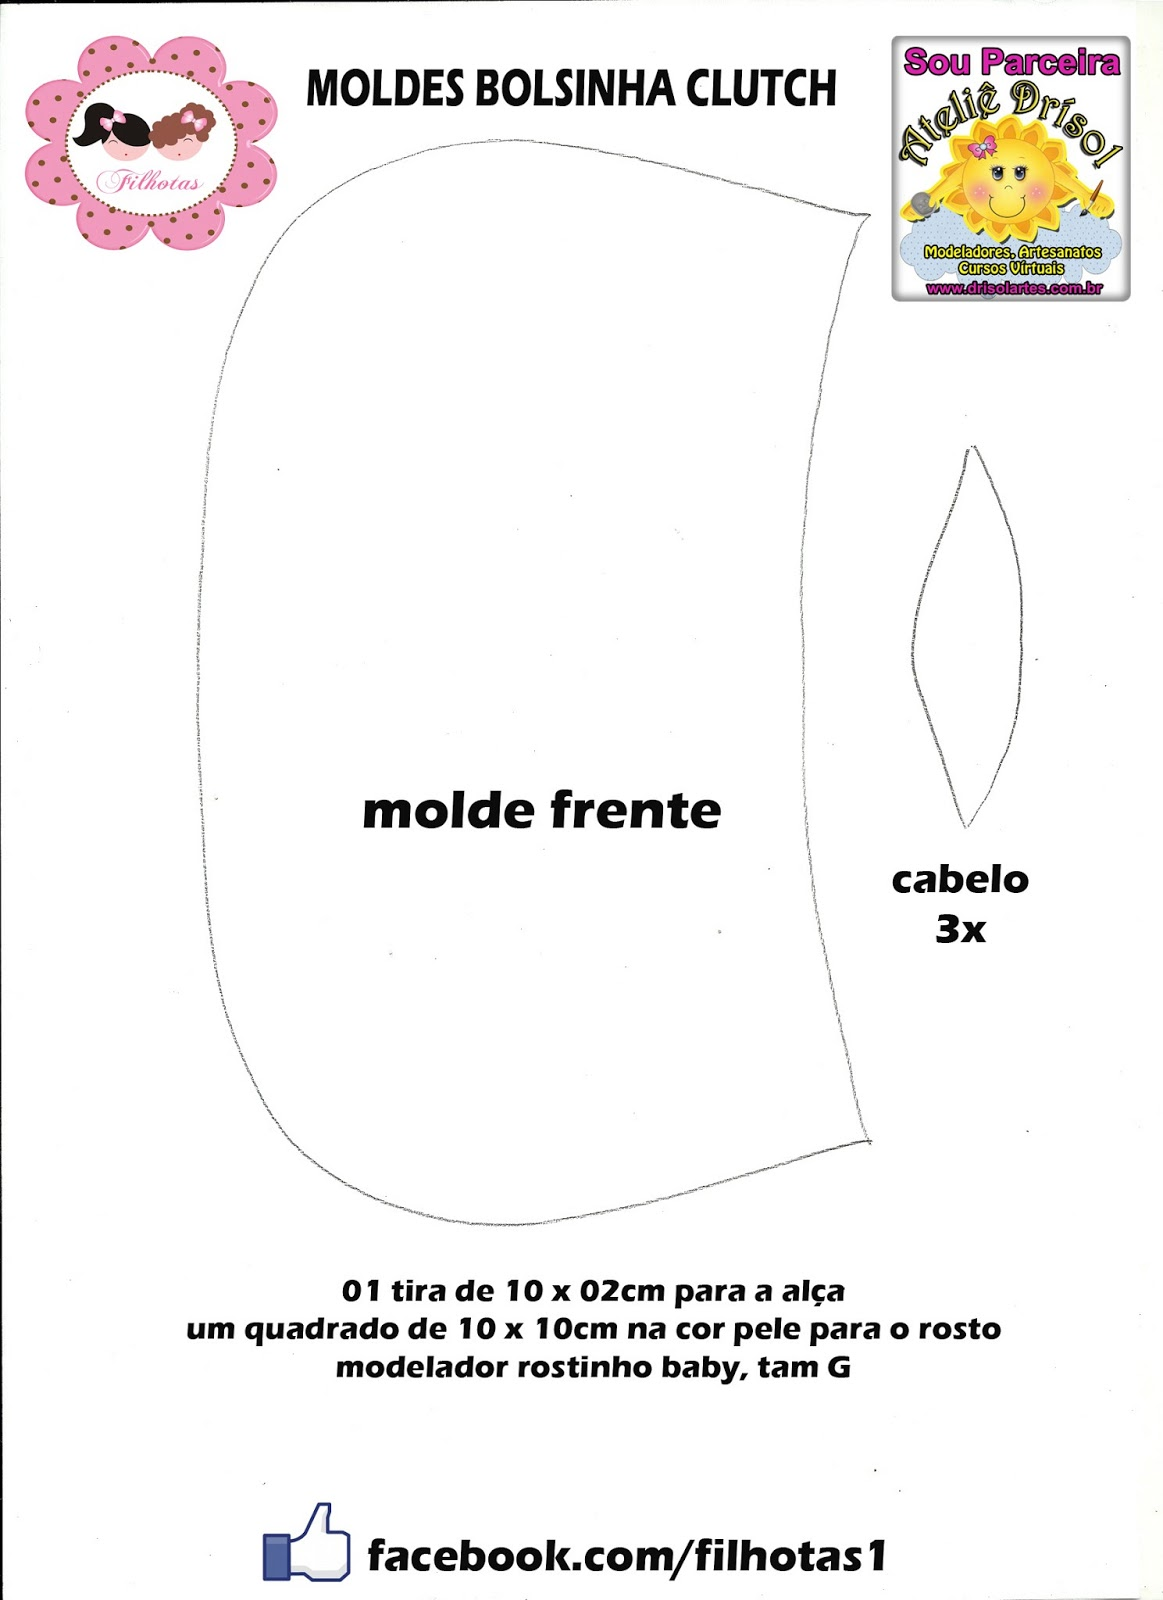 bolsita-clutch-moldes-02